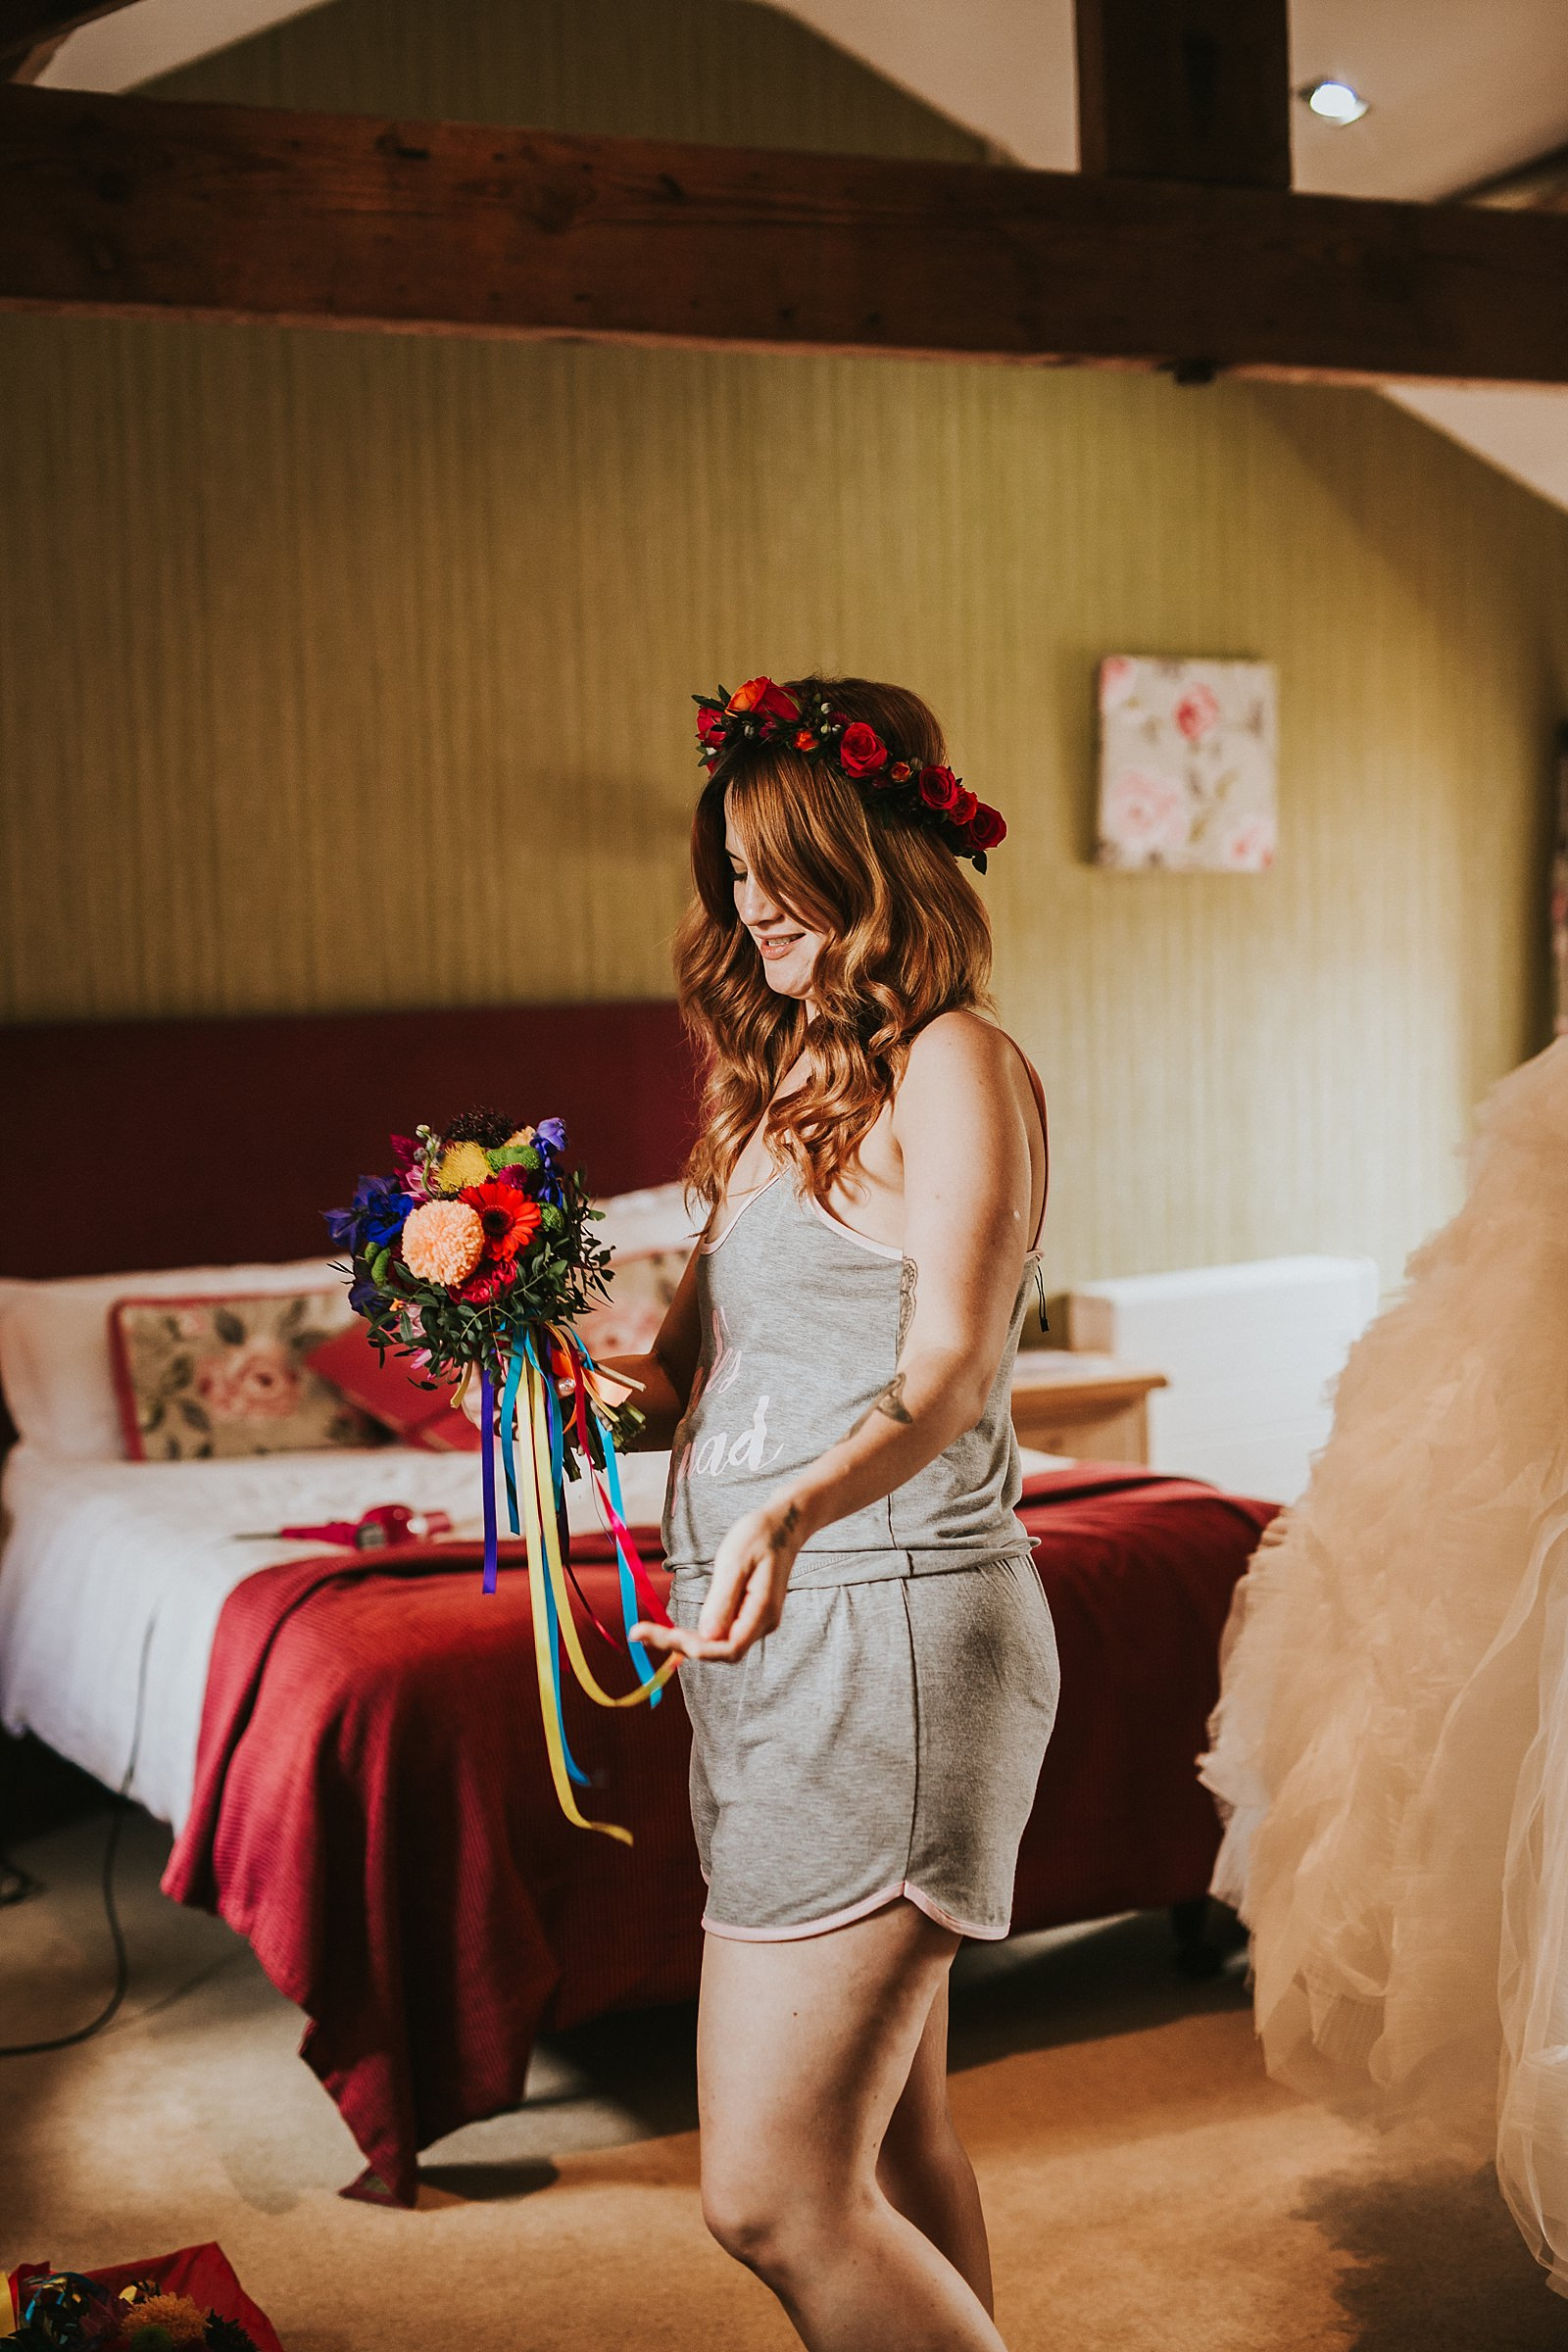 granary-at-fawsly-wedding-paula-stephen-103